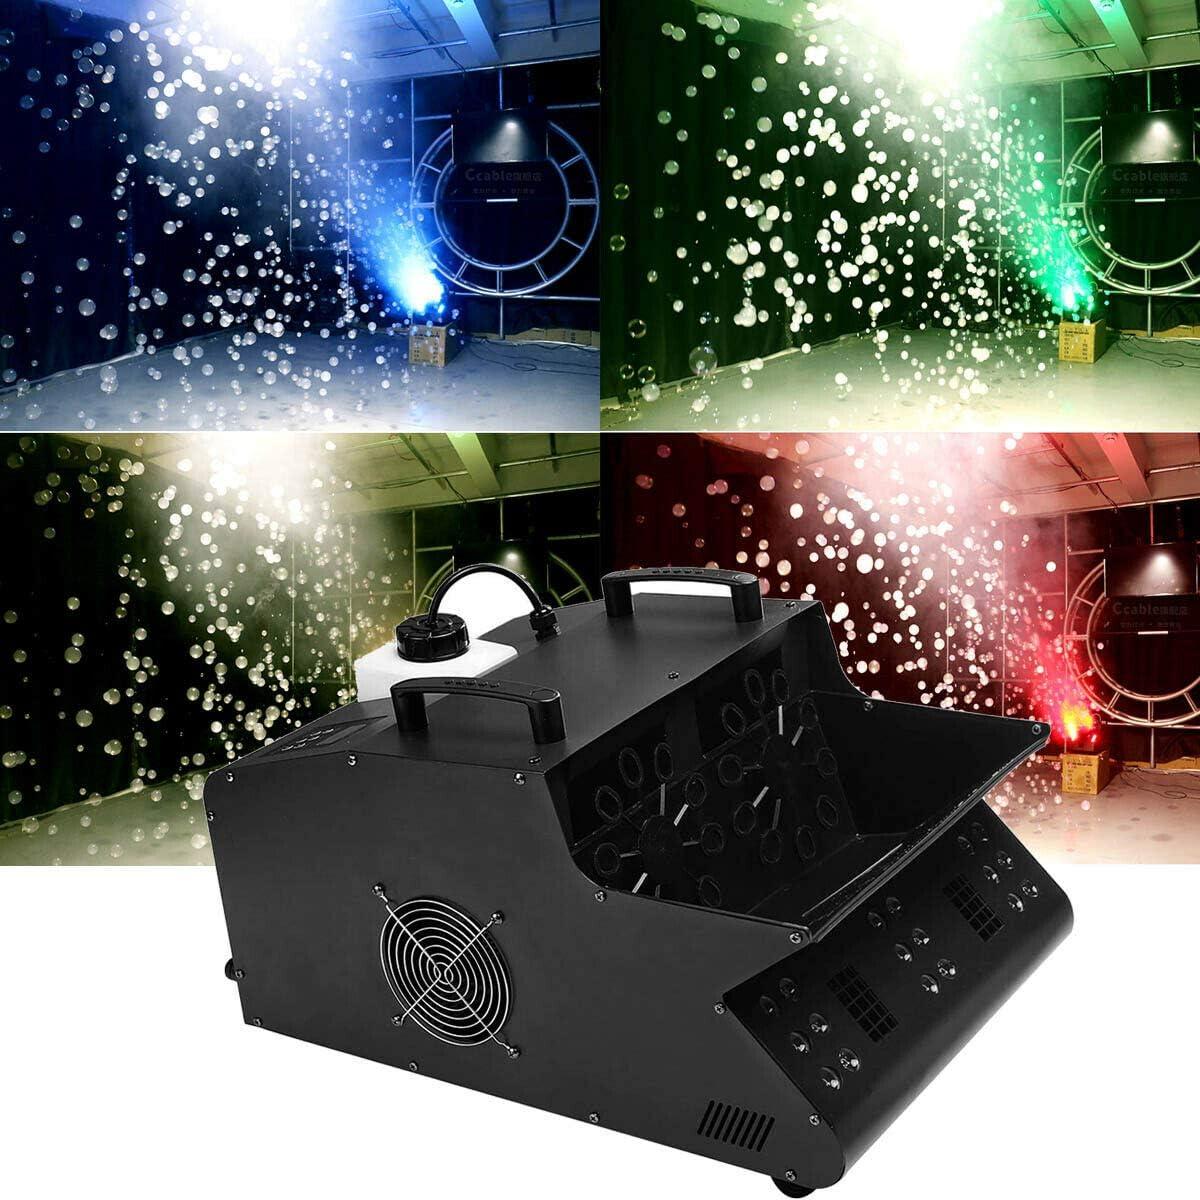 Tengchang 3000W DMX Fog Bubble Stage Effect 引出物 Re Machine Halloween 全品最安値に挑戦